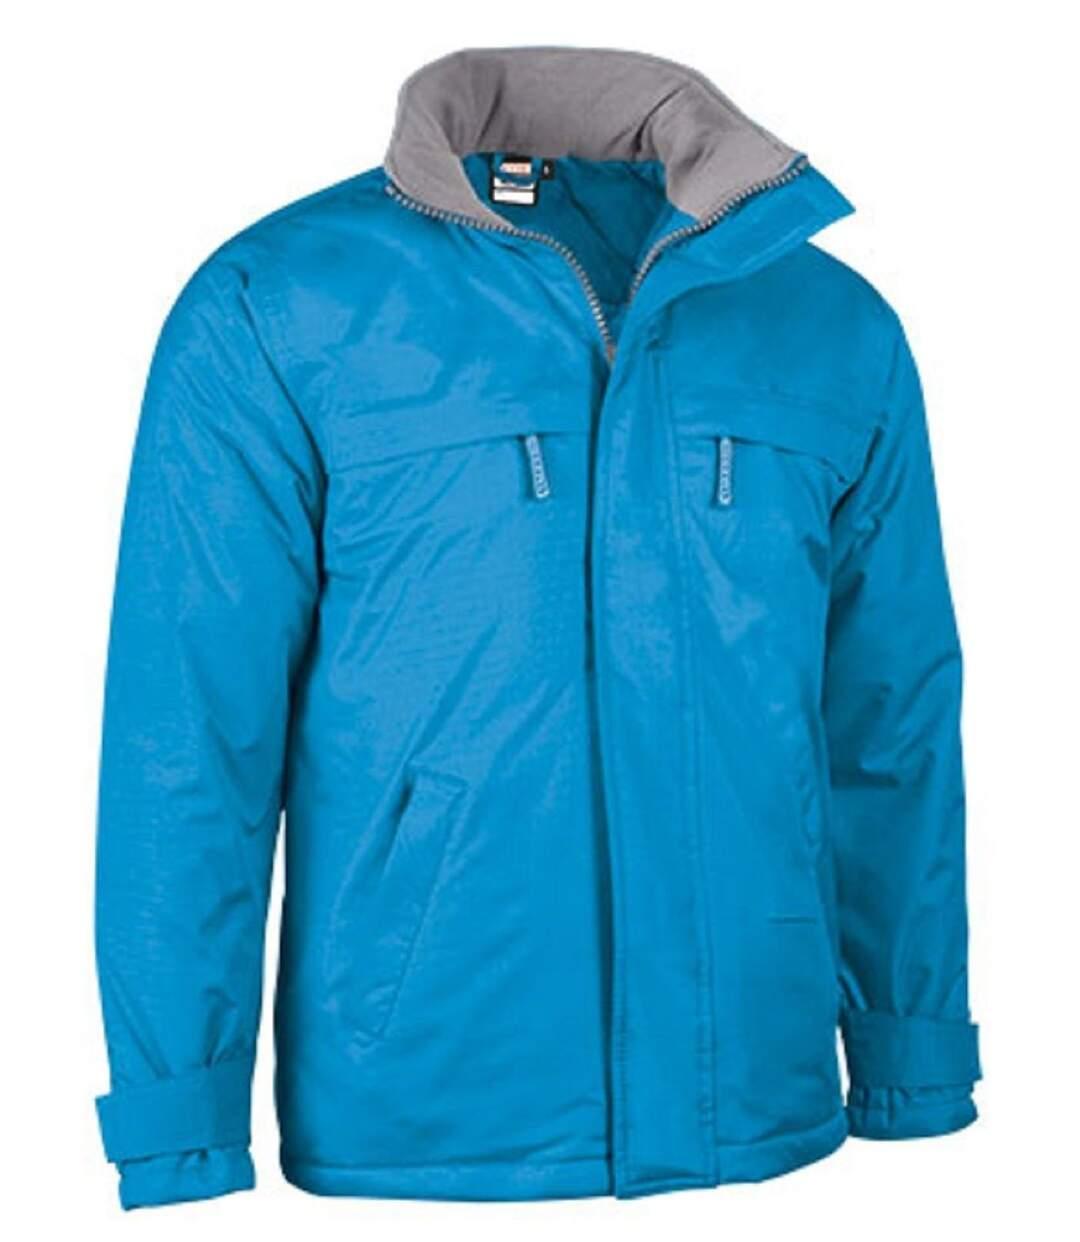 Parka - Homme - REF BOREAL - bleu tropical